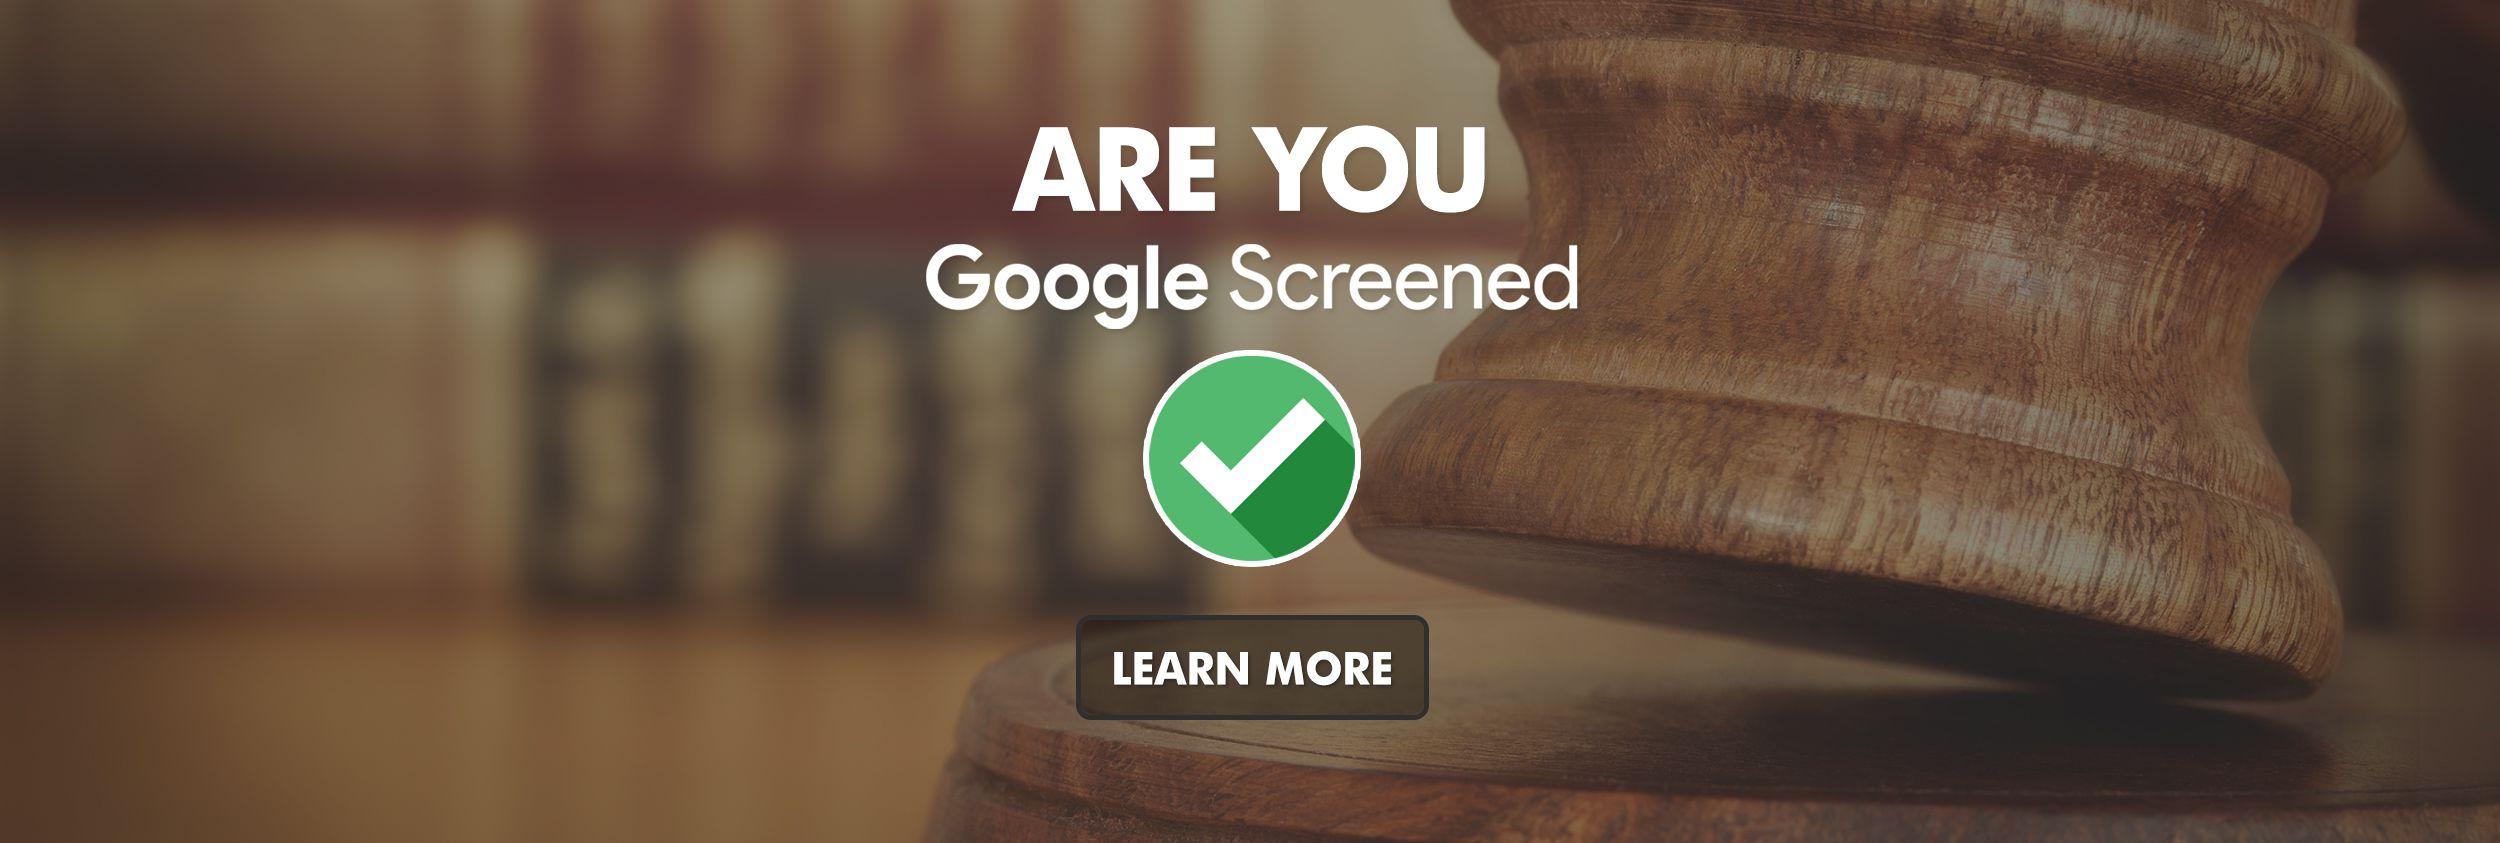 Omg Googlescreened Slider Tablet